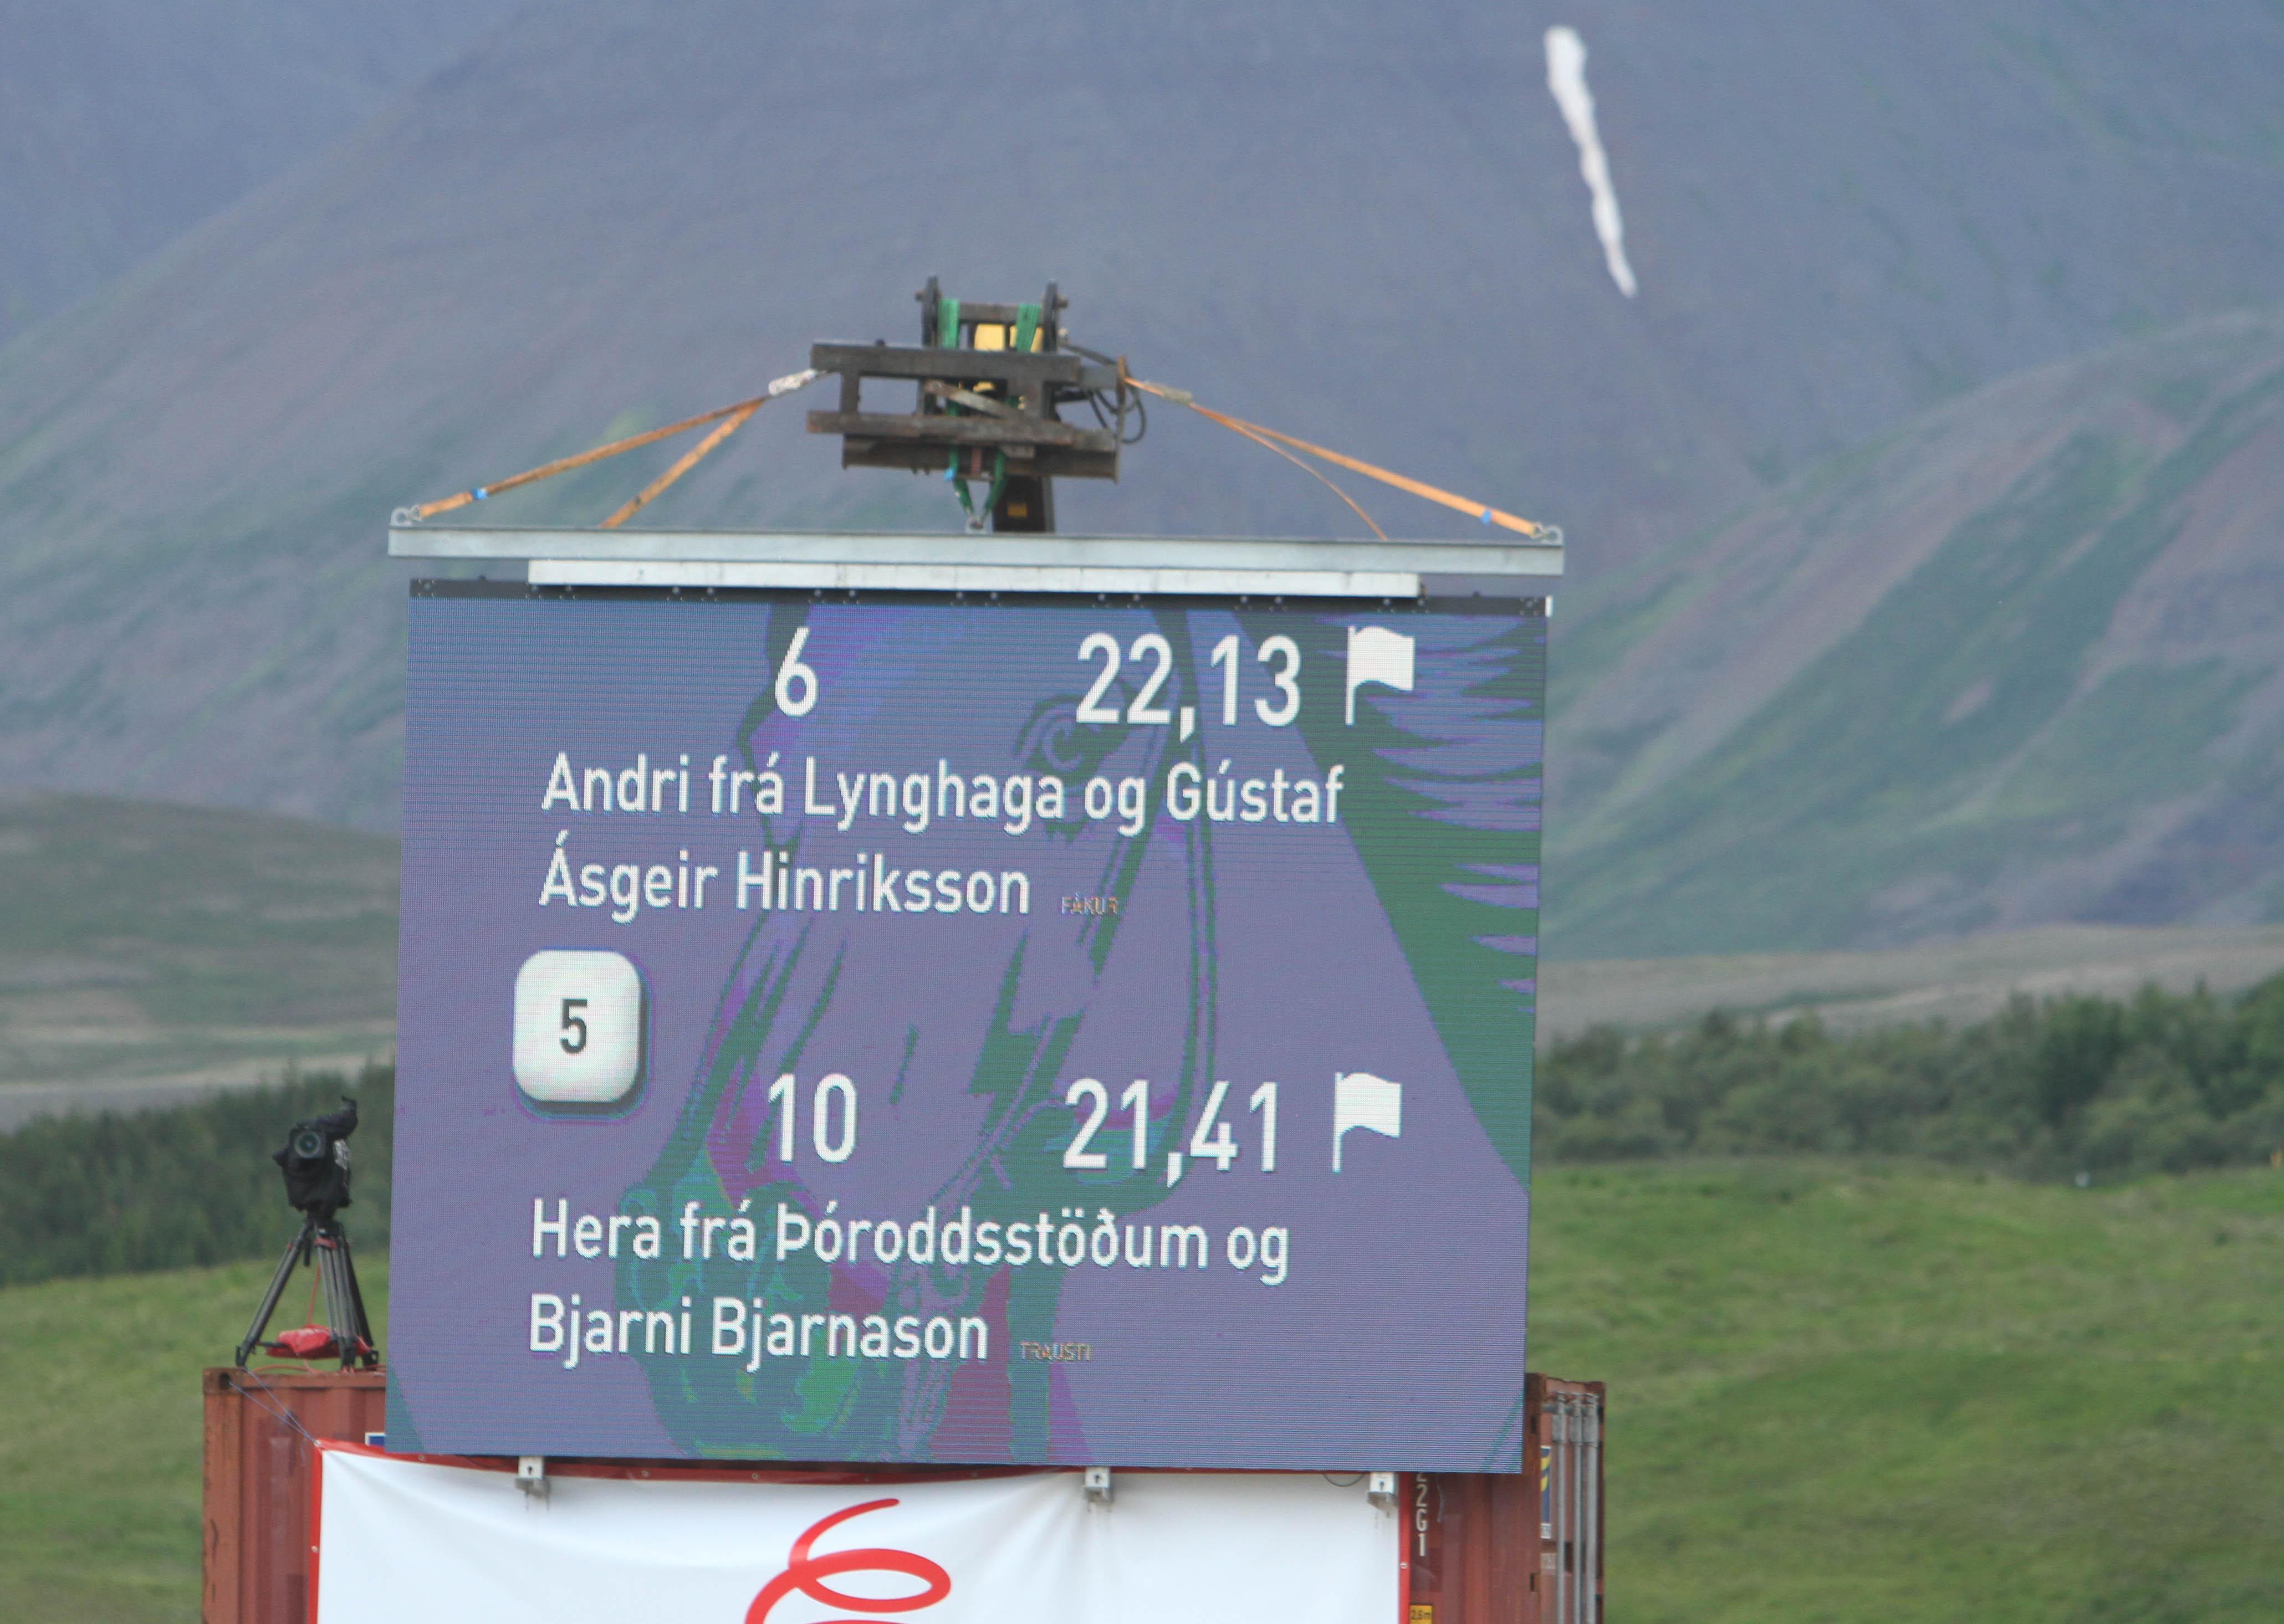 Hera did it! Foto: Karin Cederman(ishestnews.se